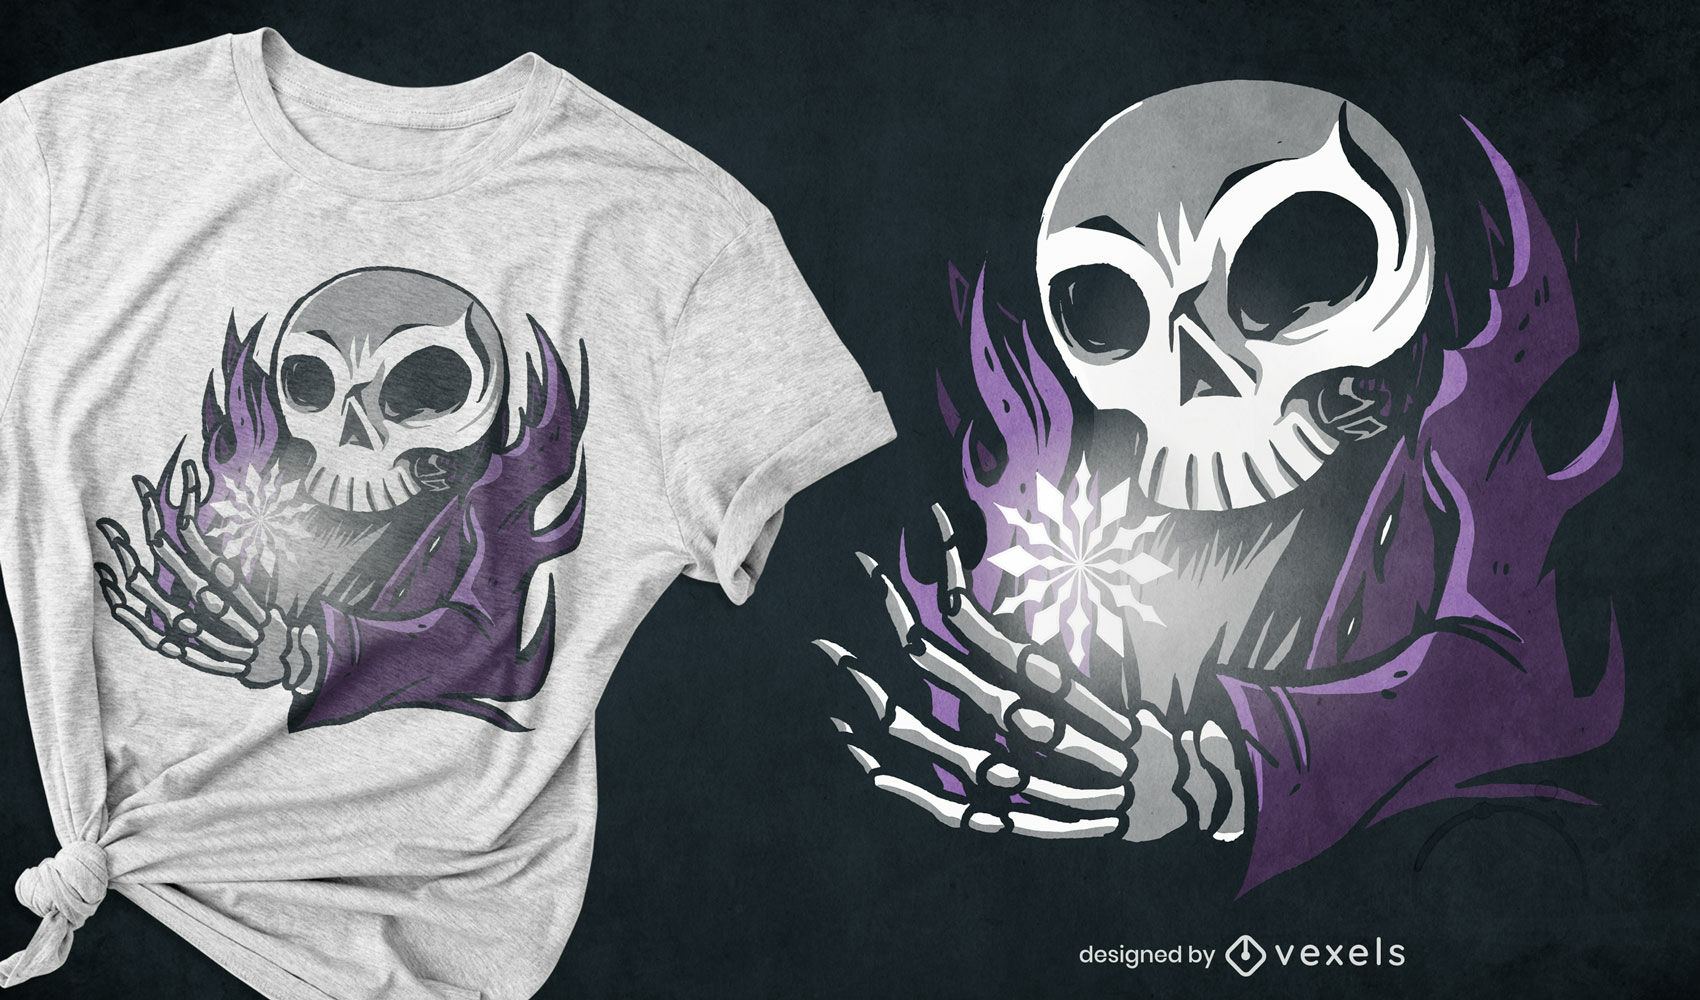 Dise?o de camiseta de esqueleto y copo de nieve.